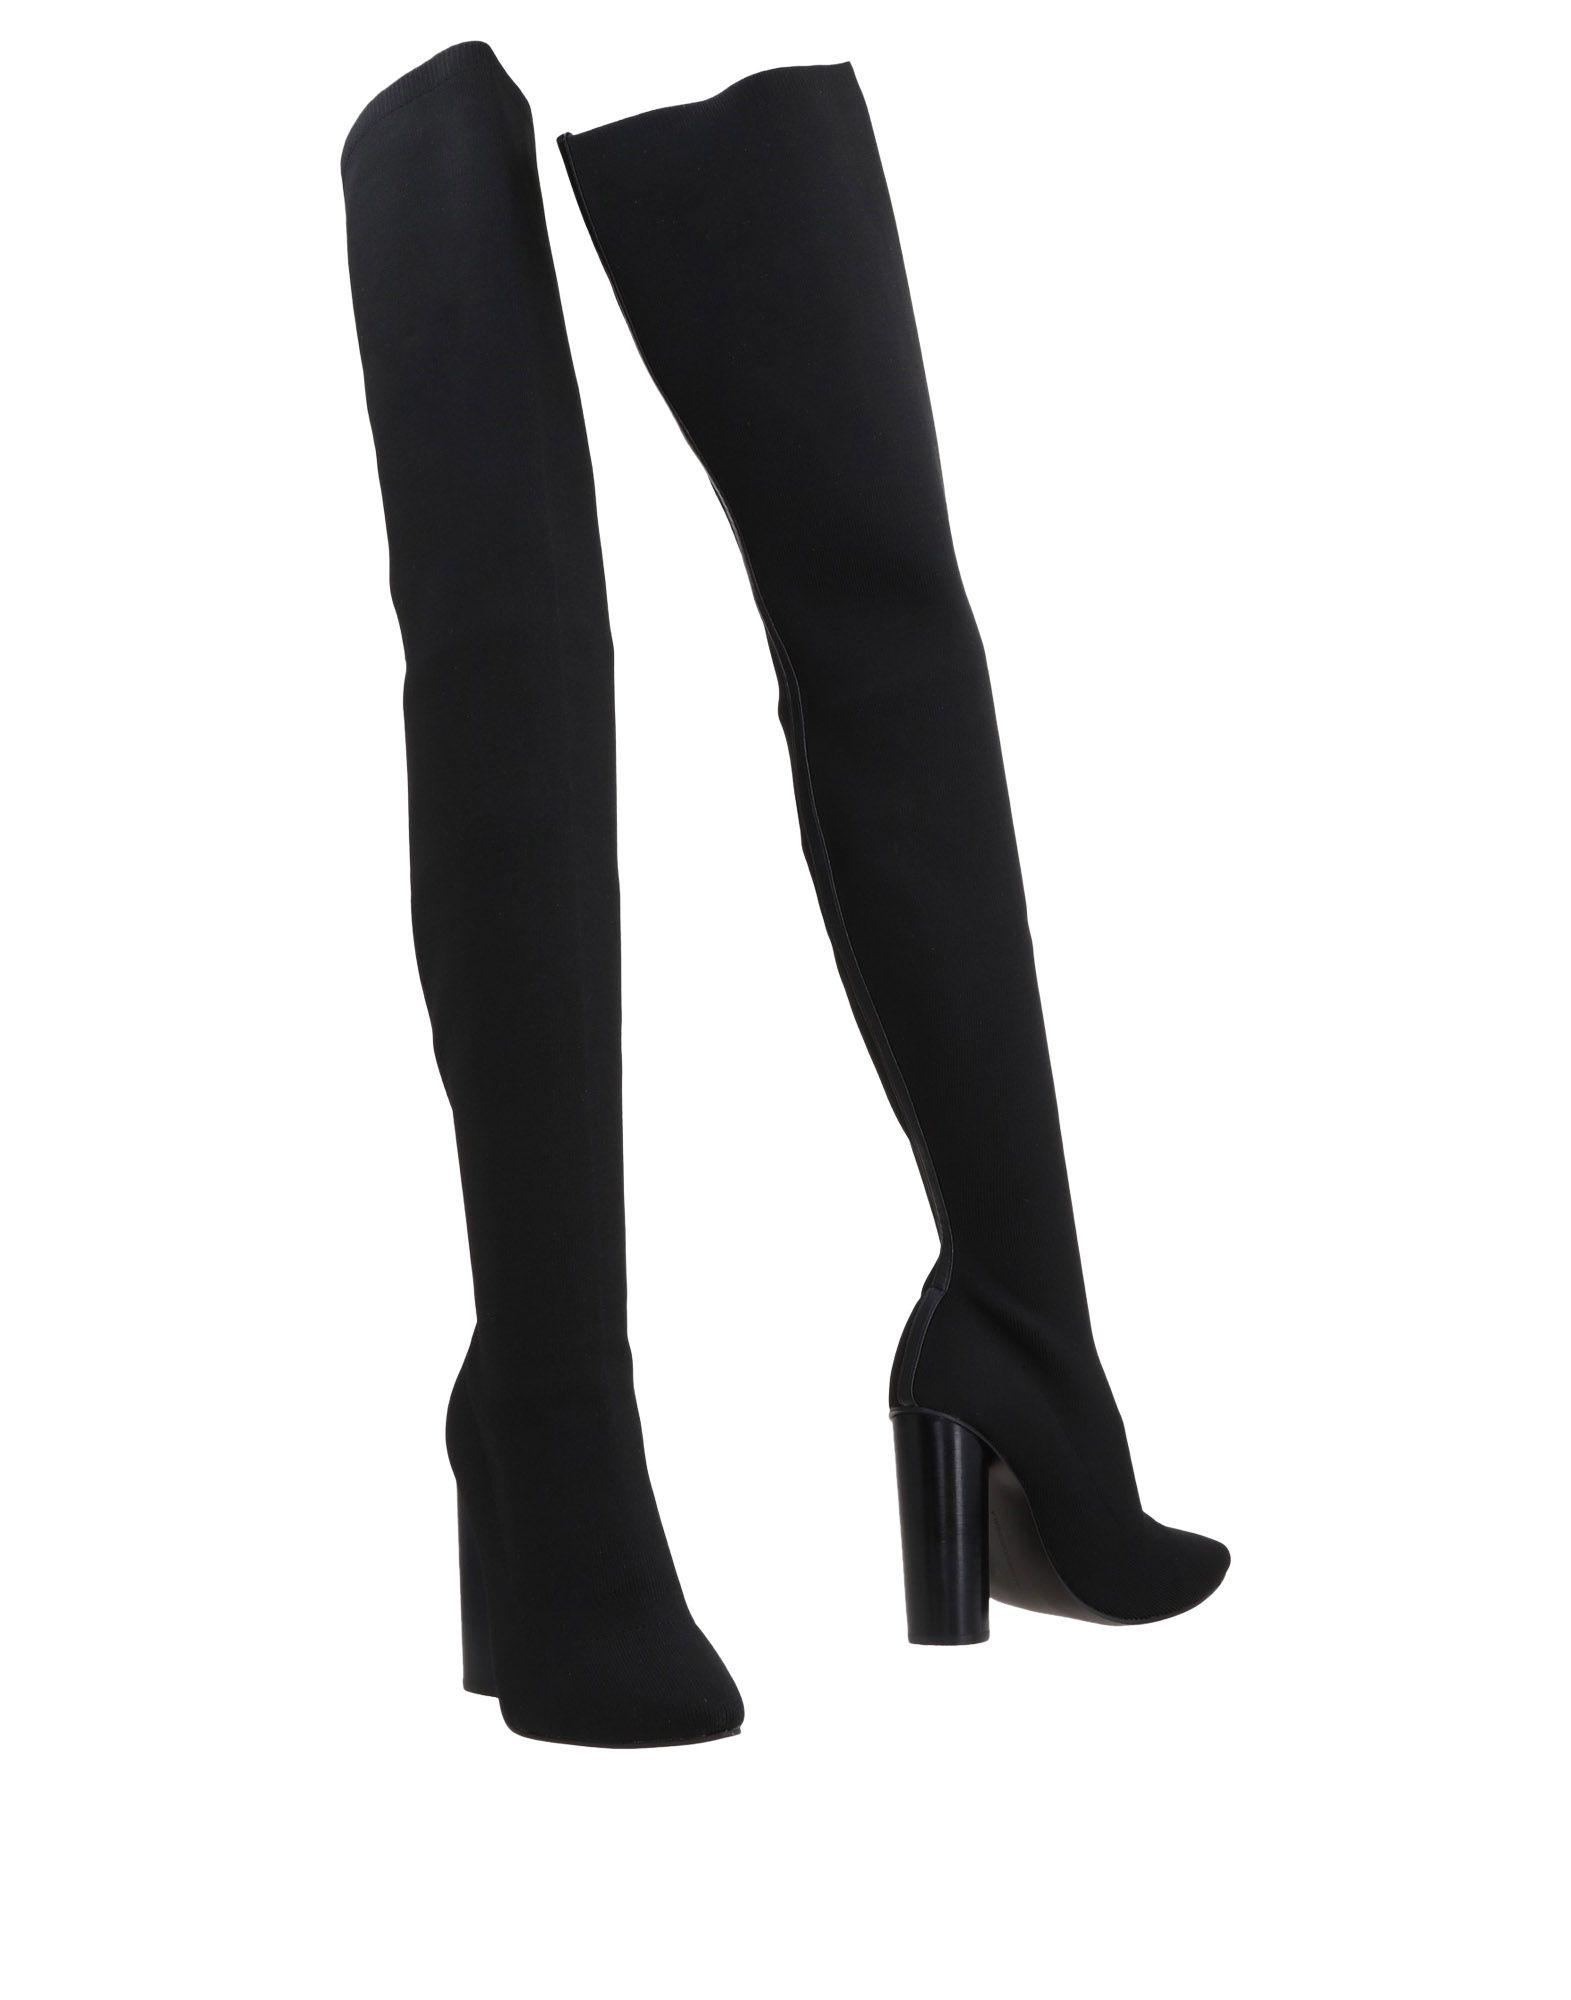 Windsor Windsor Smith Boots - Women Windsor Windsor Smith Boots online on  Australia - 11477784RL bb99d1